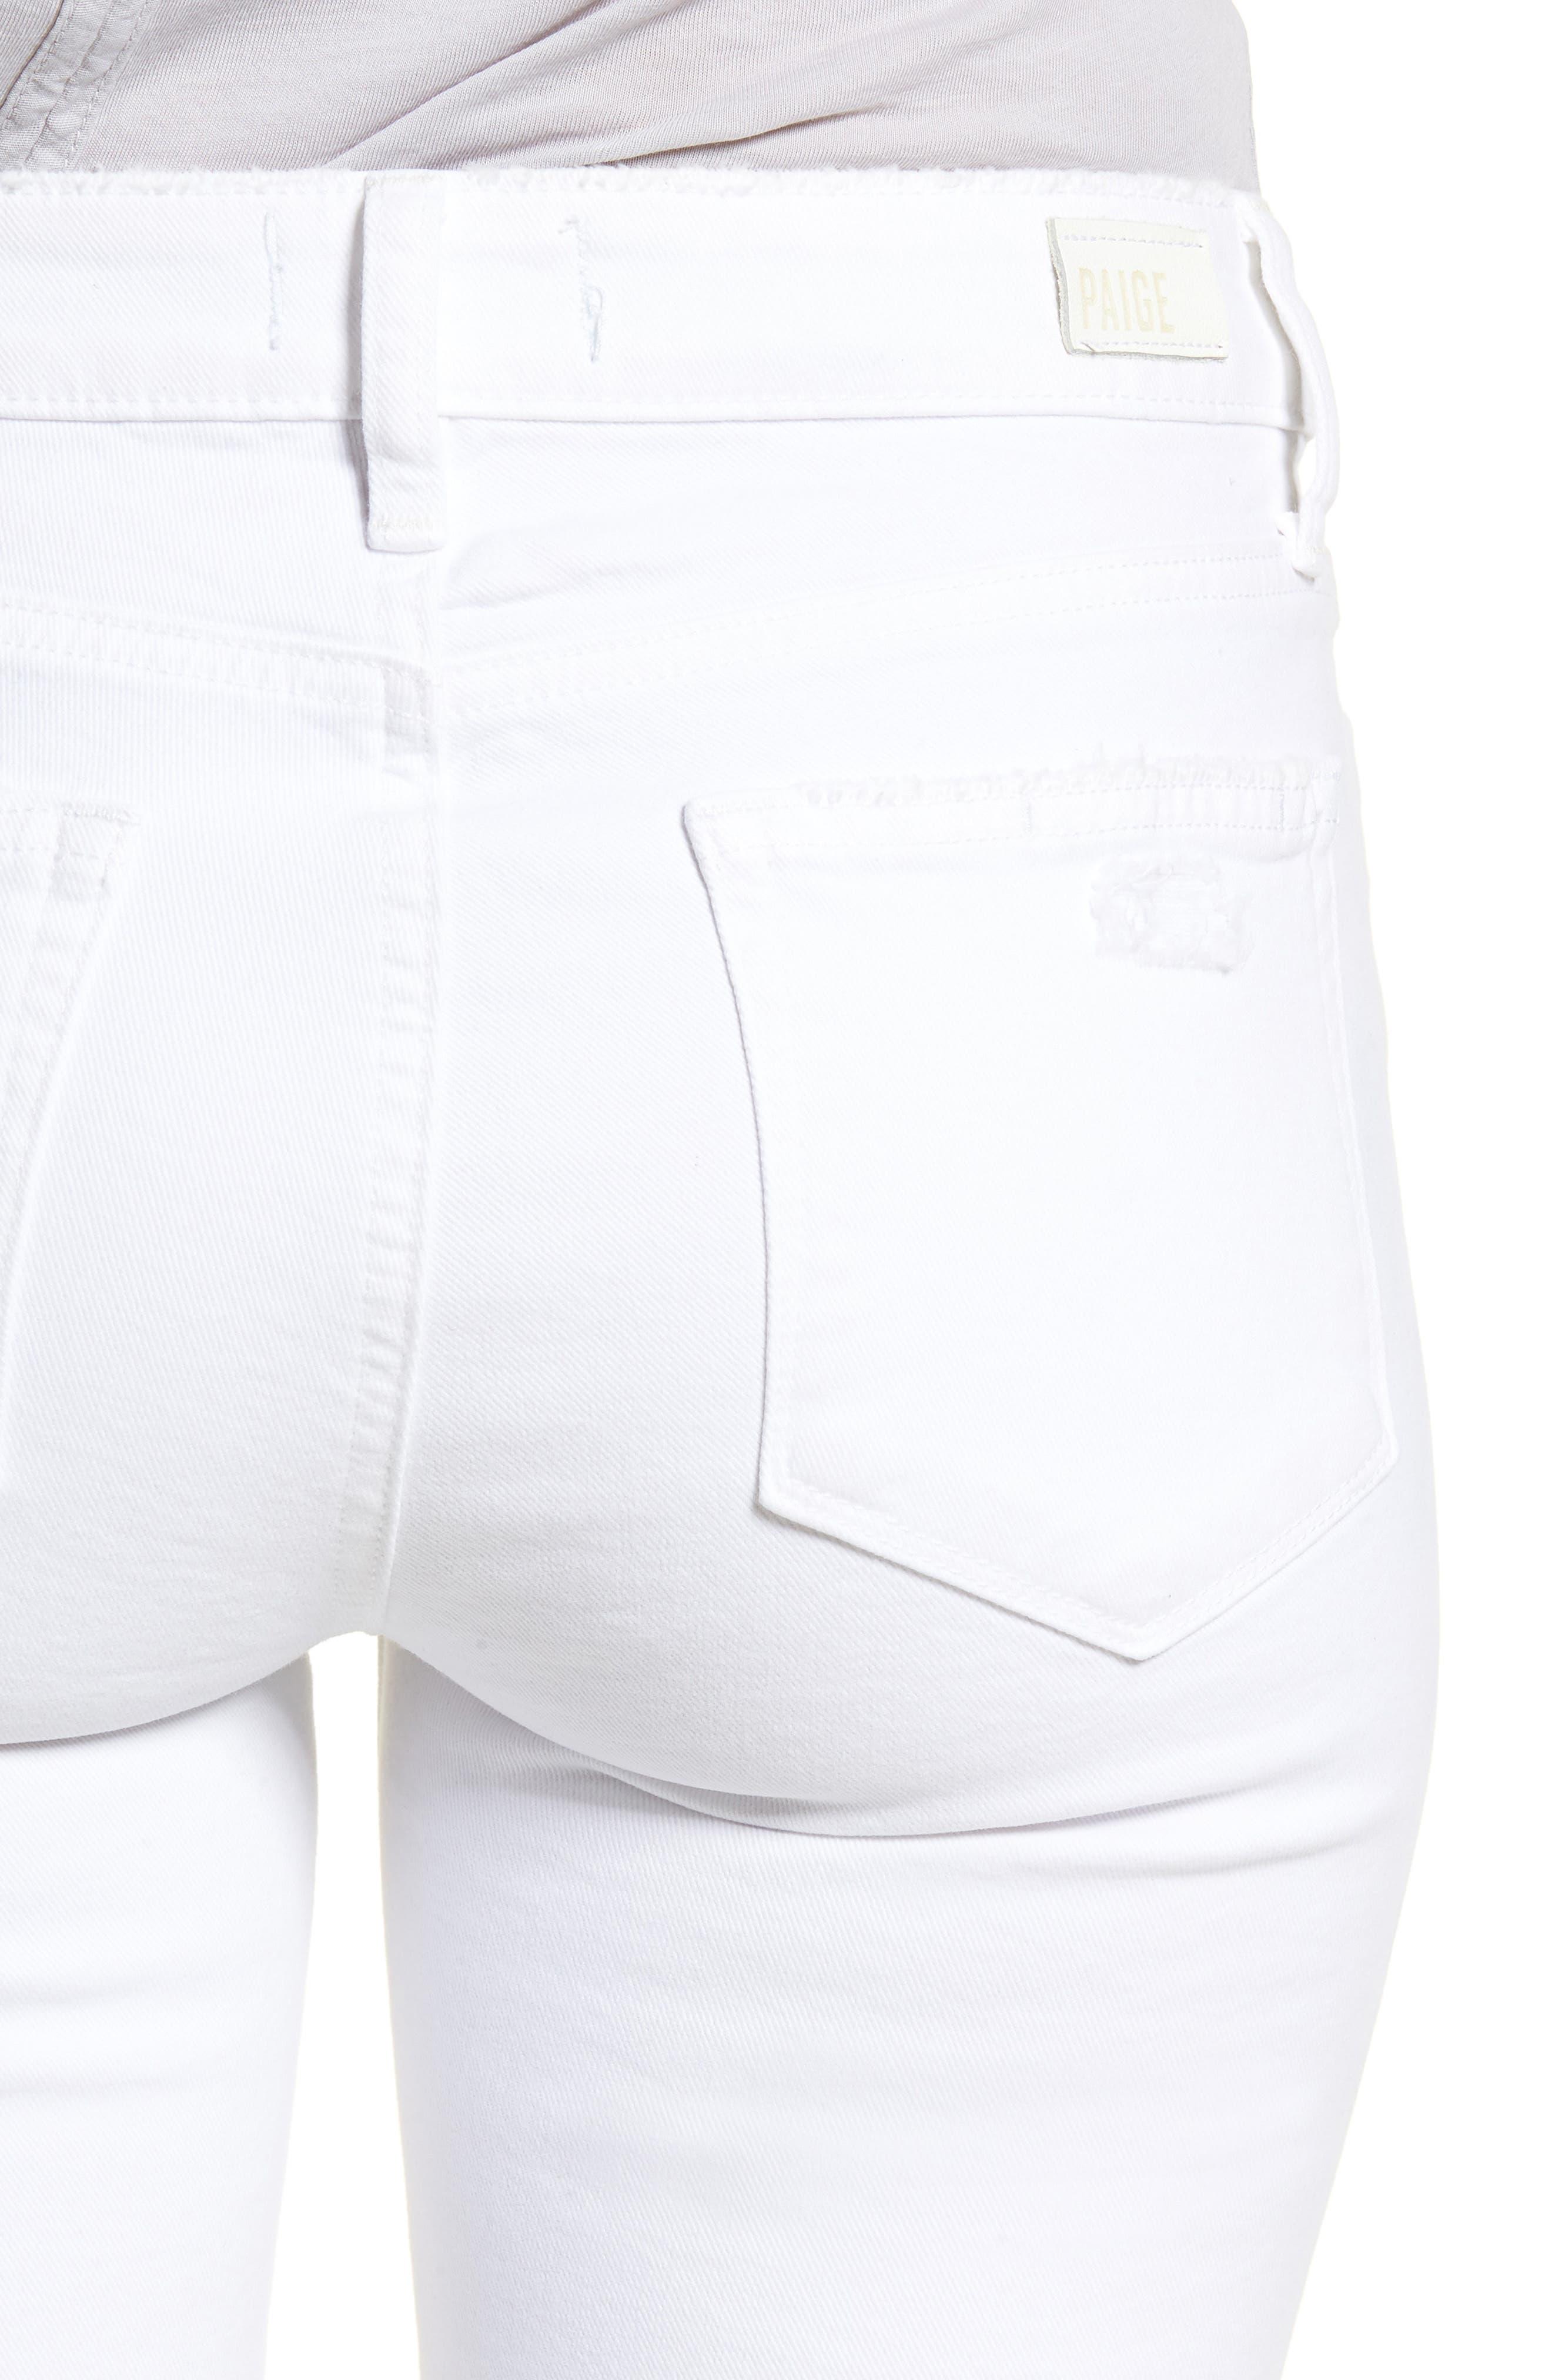 Verdugo Ripped Ultra Skinny Jeans,                             Alternate thumbnail 4, color,                             100